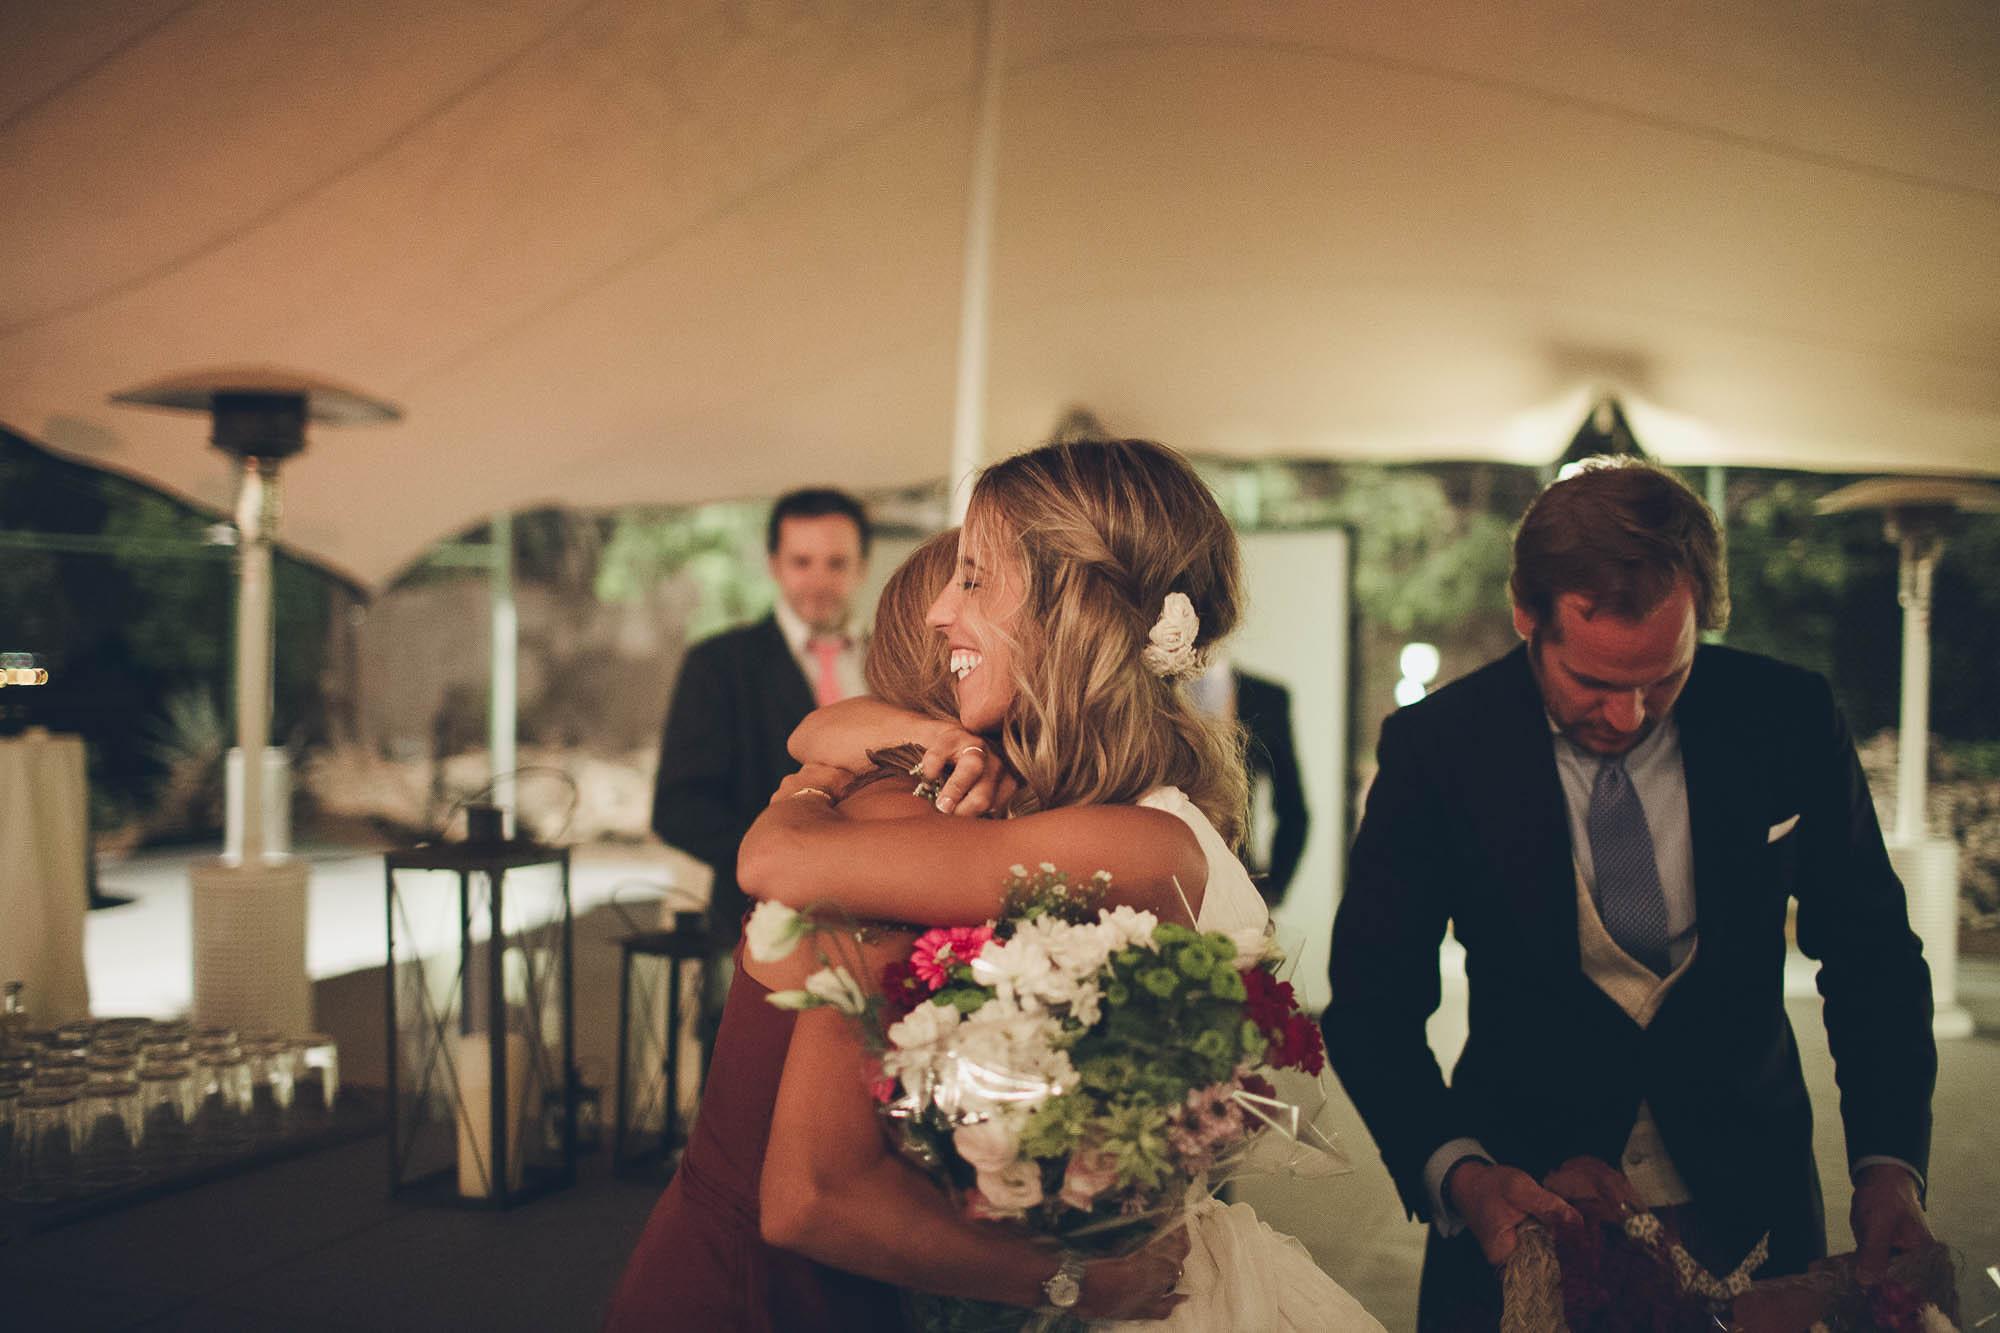 La novia abraza a una amiga